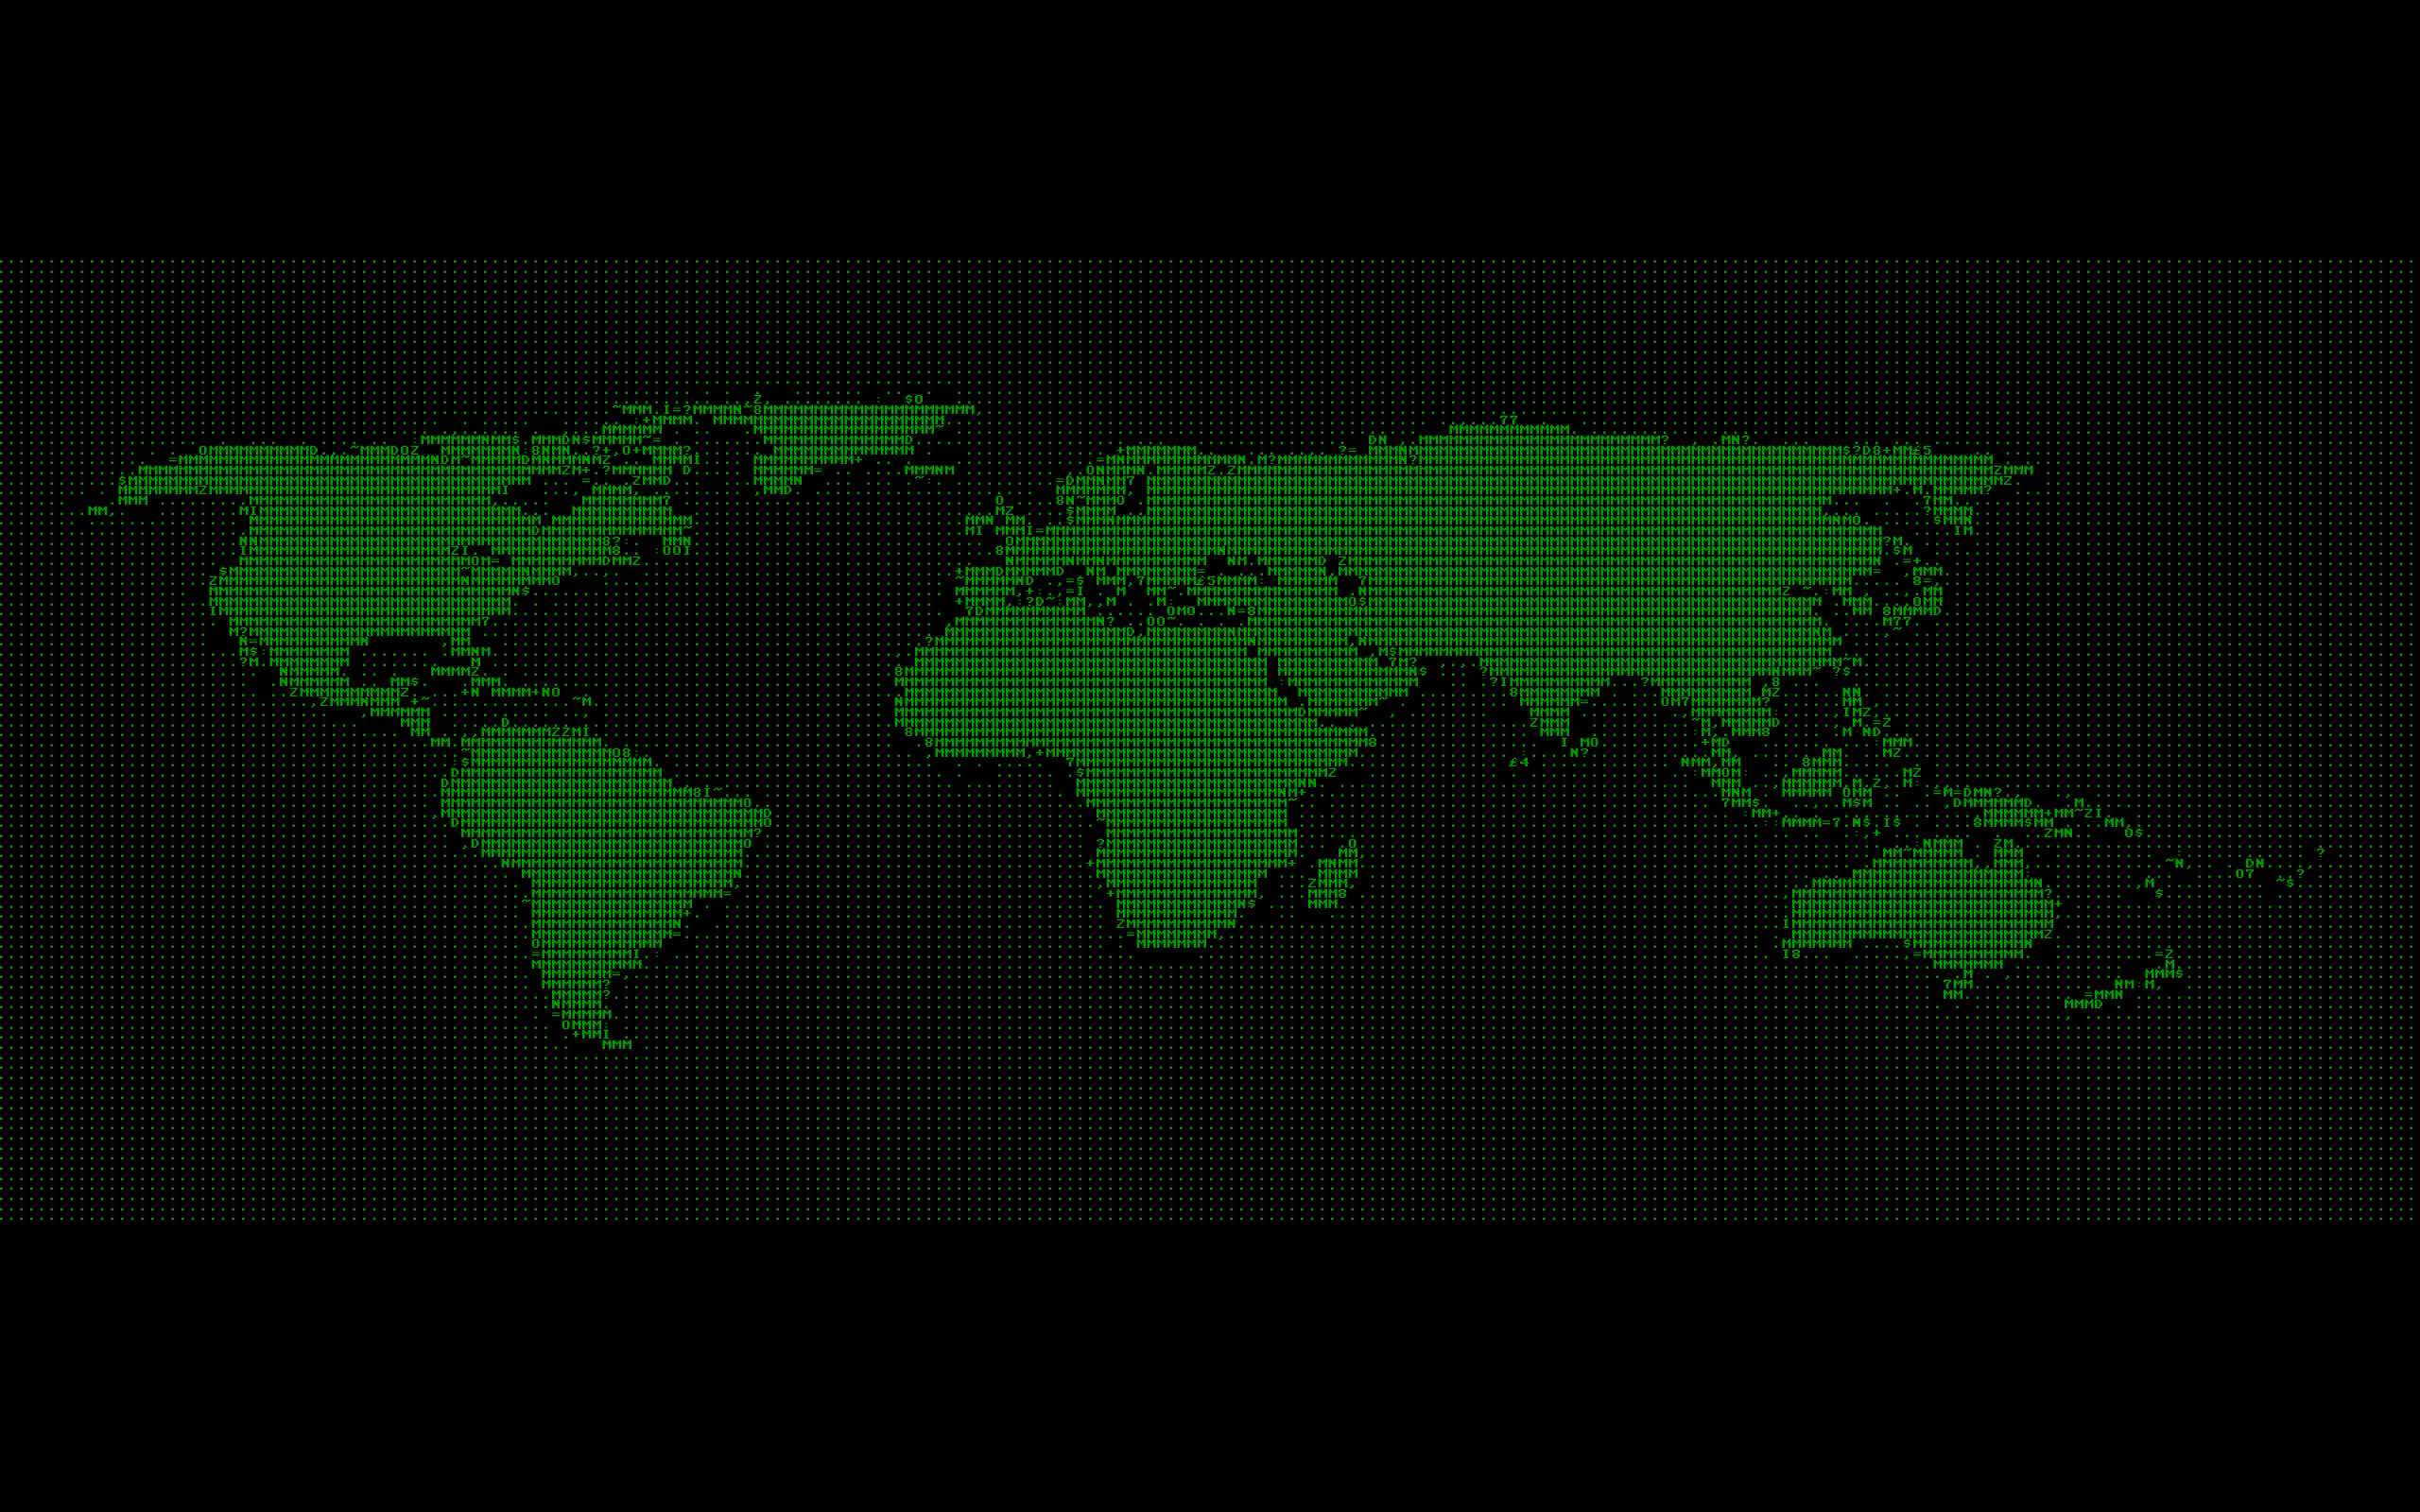 Green Retro Cyberpunk Ascii Maps World Map Free Wallpaper